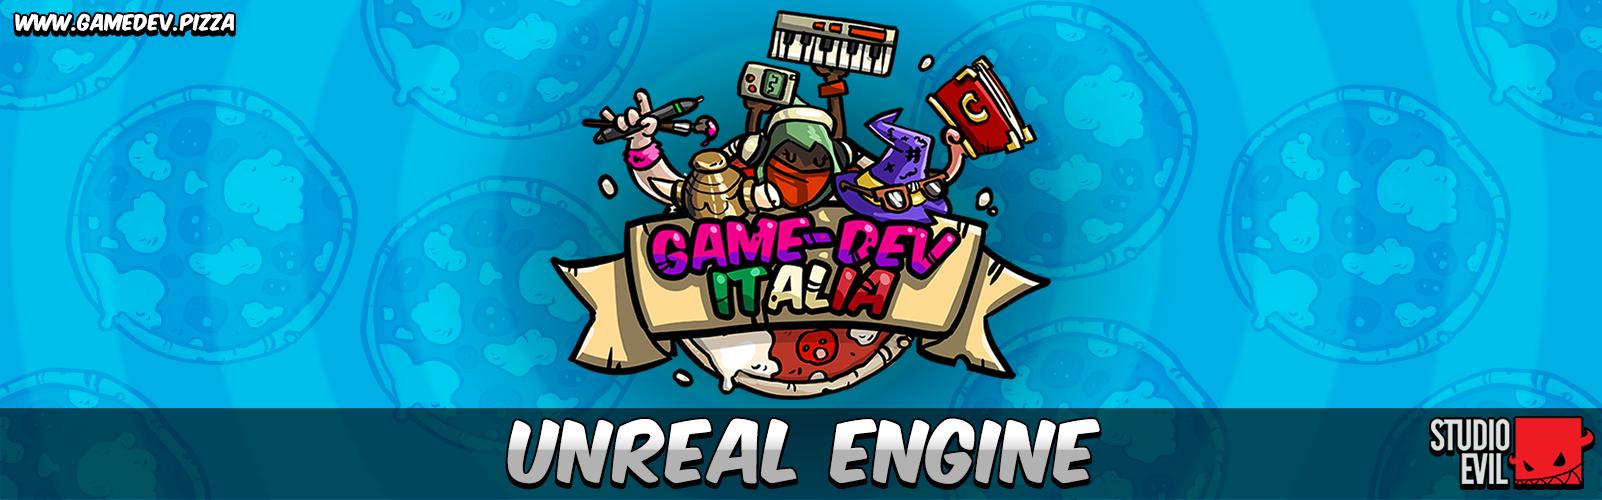 gamedev_italia_banner__0003_unreal